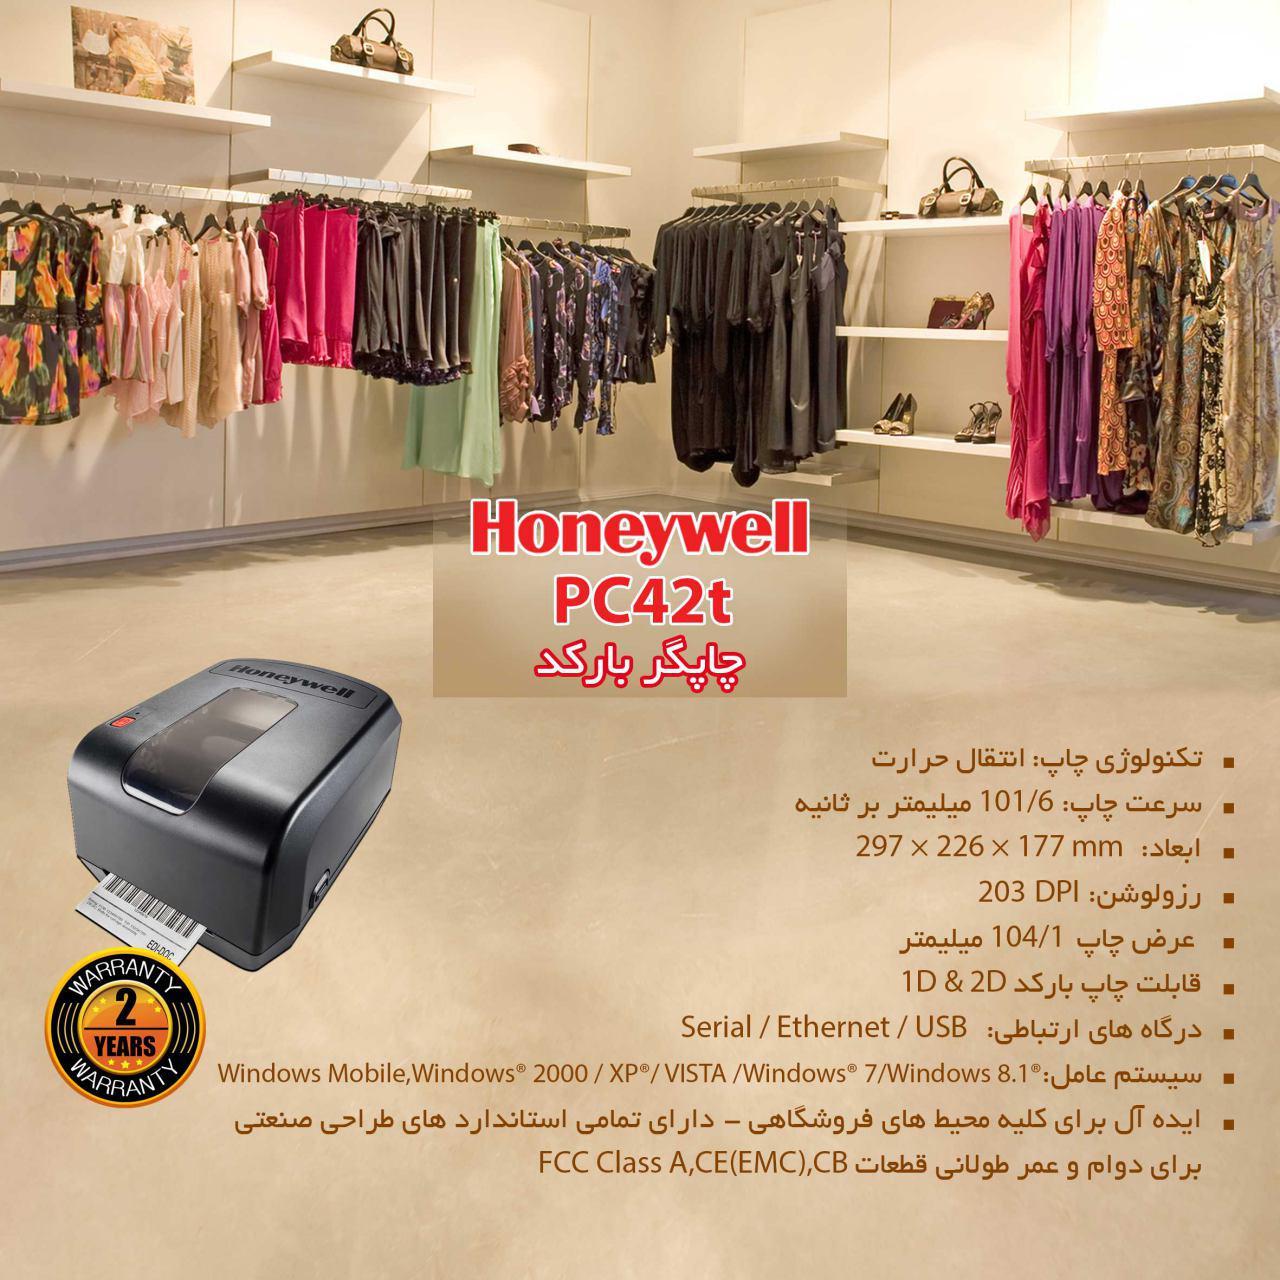 چاپگر لیبل هانیول (تحت لیسانس هانیول آمریکا)<br/>سرعت چاپ : 101/6 میلیمتر بر ثانیه<br/>رزولیشن : 203DPI<br/>عرض چاپ بارکد 1D&amp;amp;amp;2D<br/>درگاه ارتباطی : Serial digital-appliances printer-scanner printer-scanner